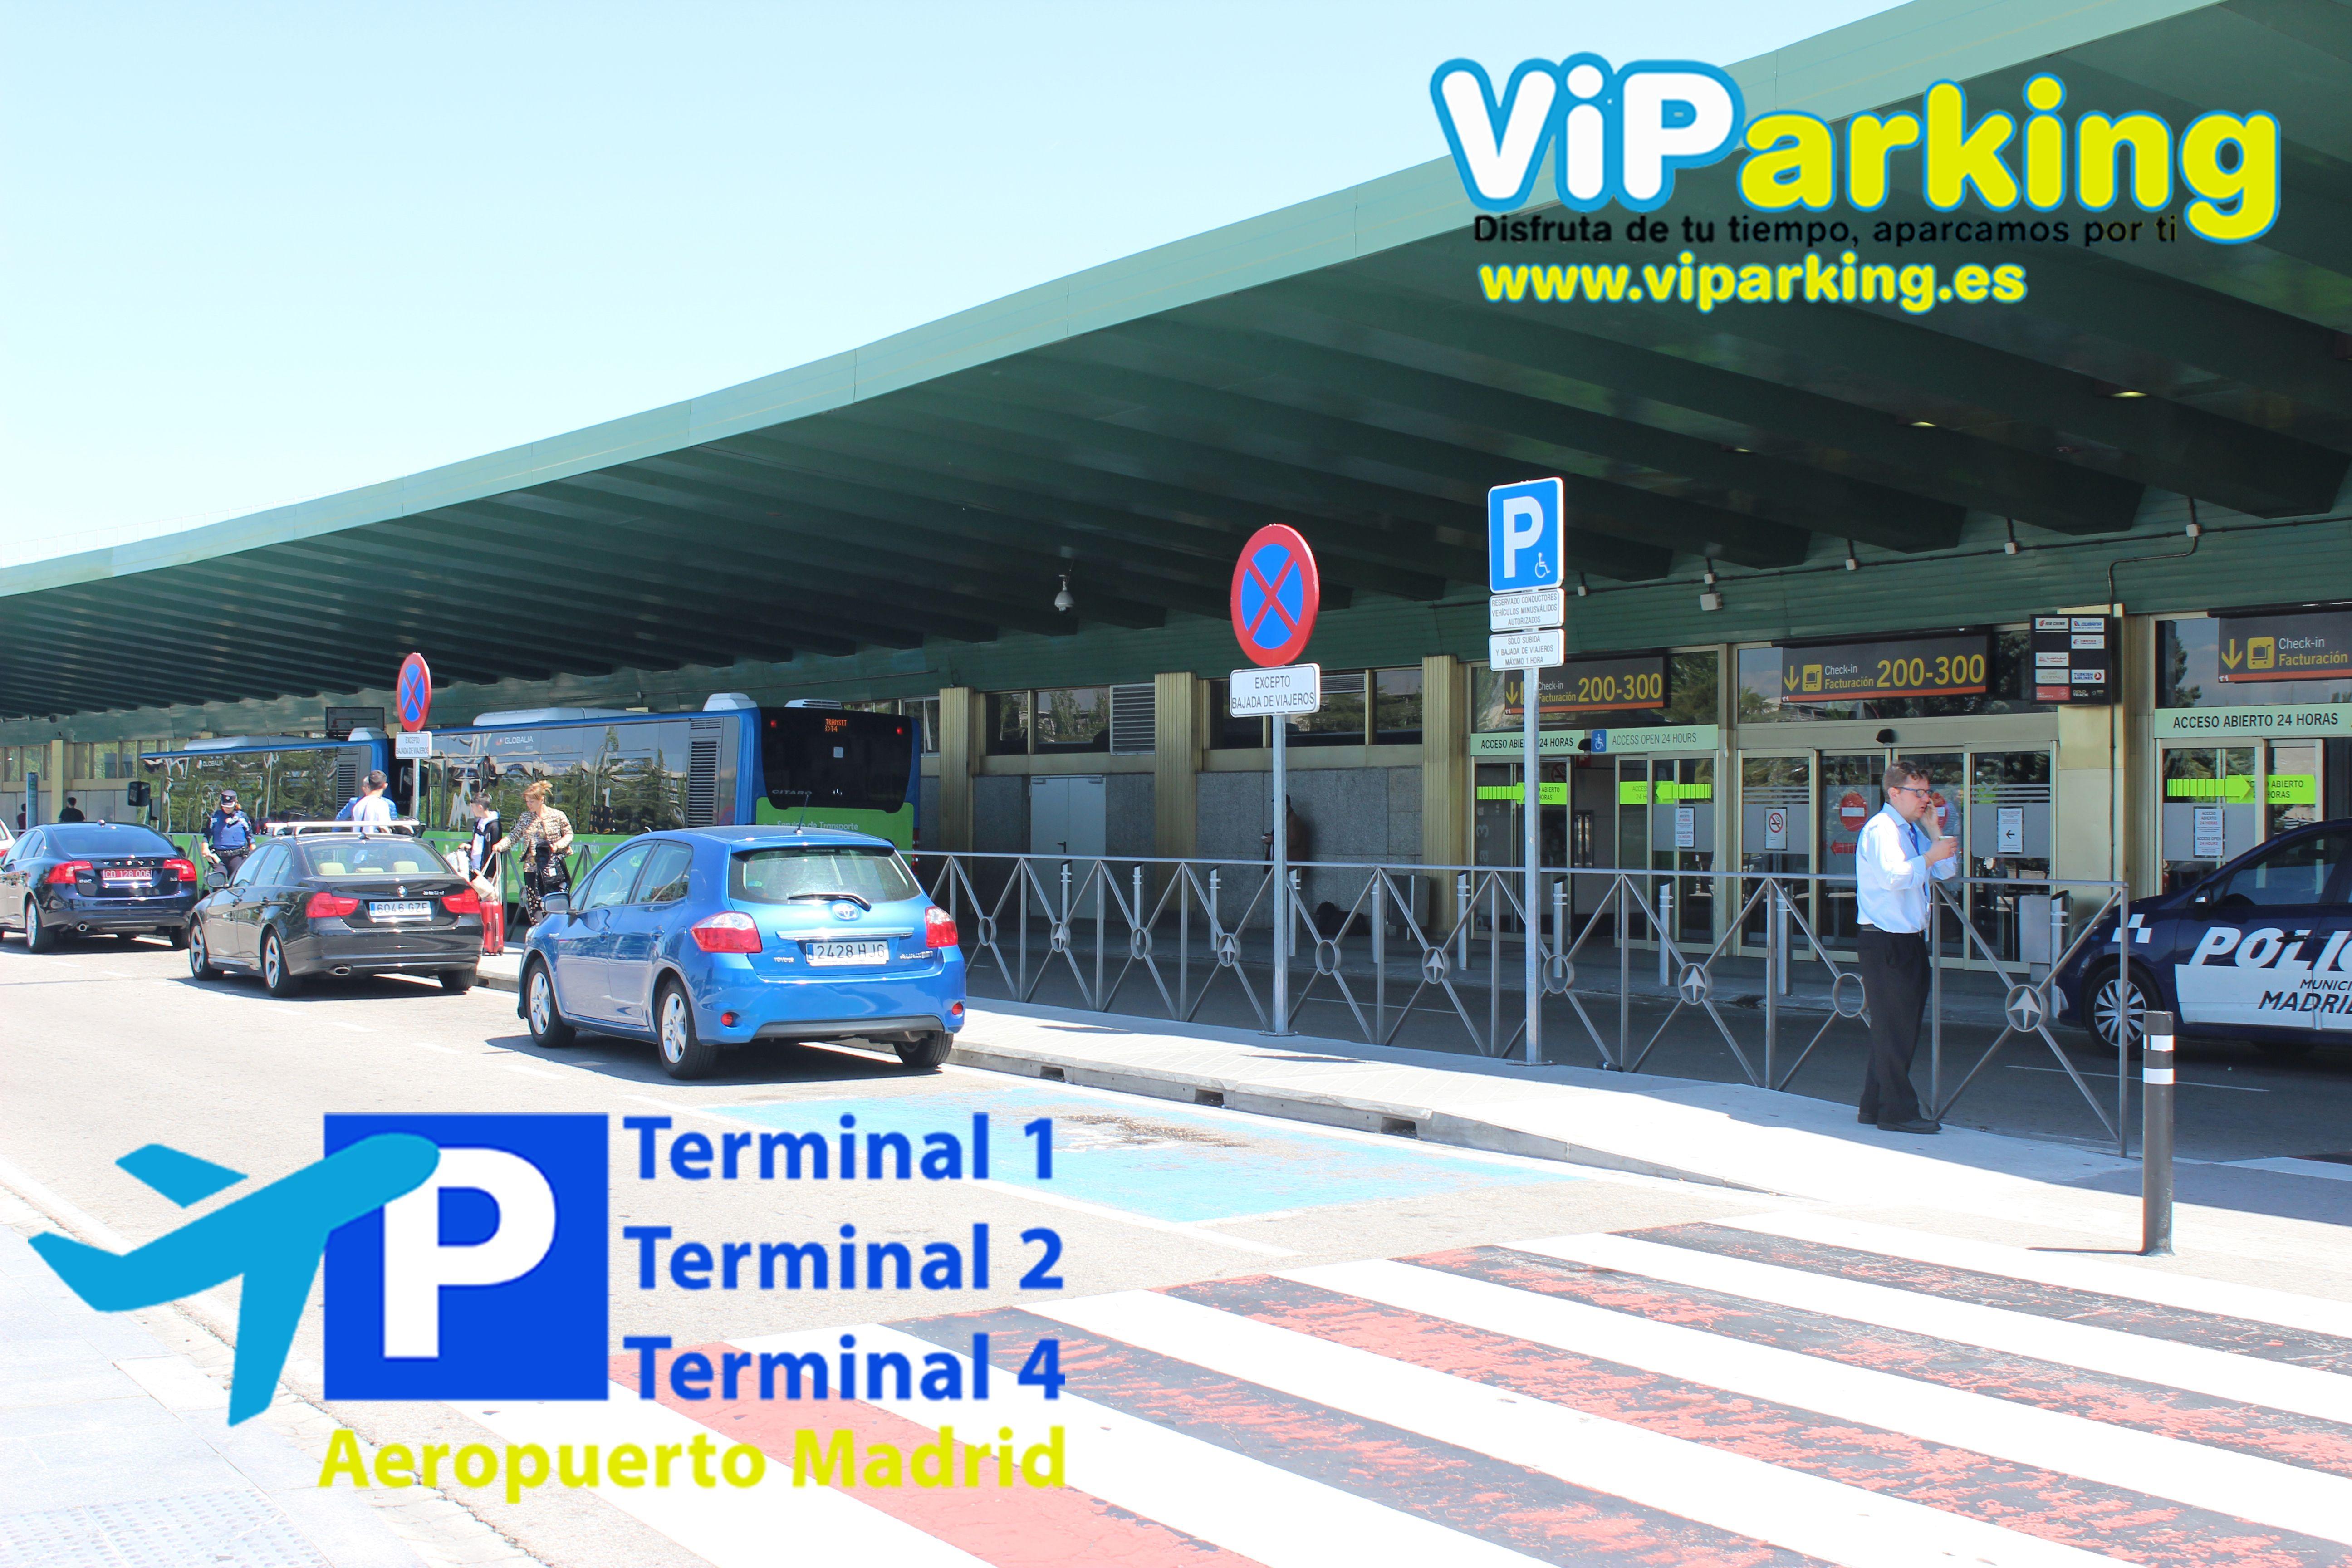 Parking Aeropuerto Madrid T1 Parking Aeropuerto Madre